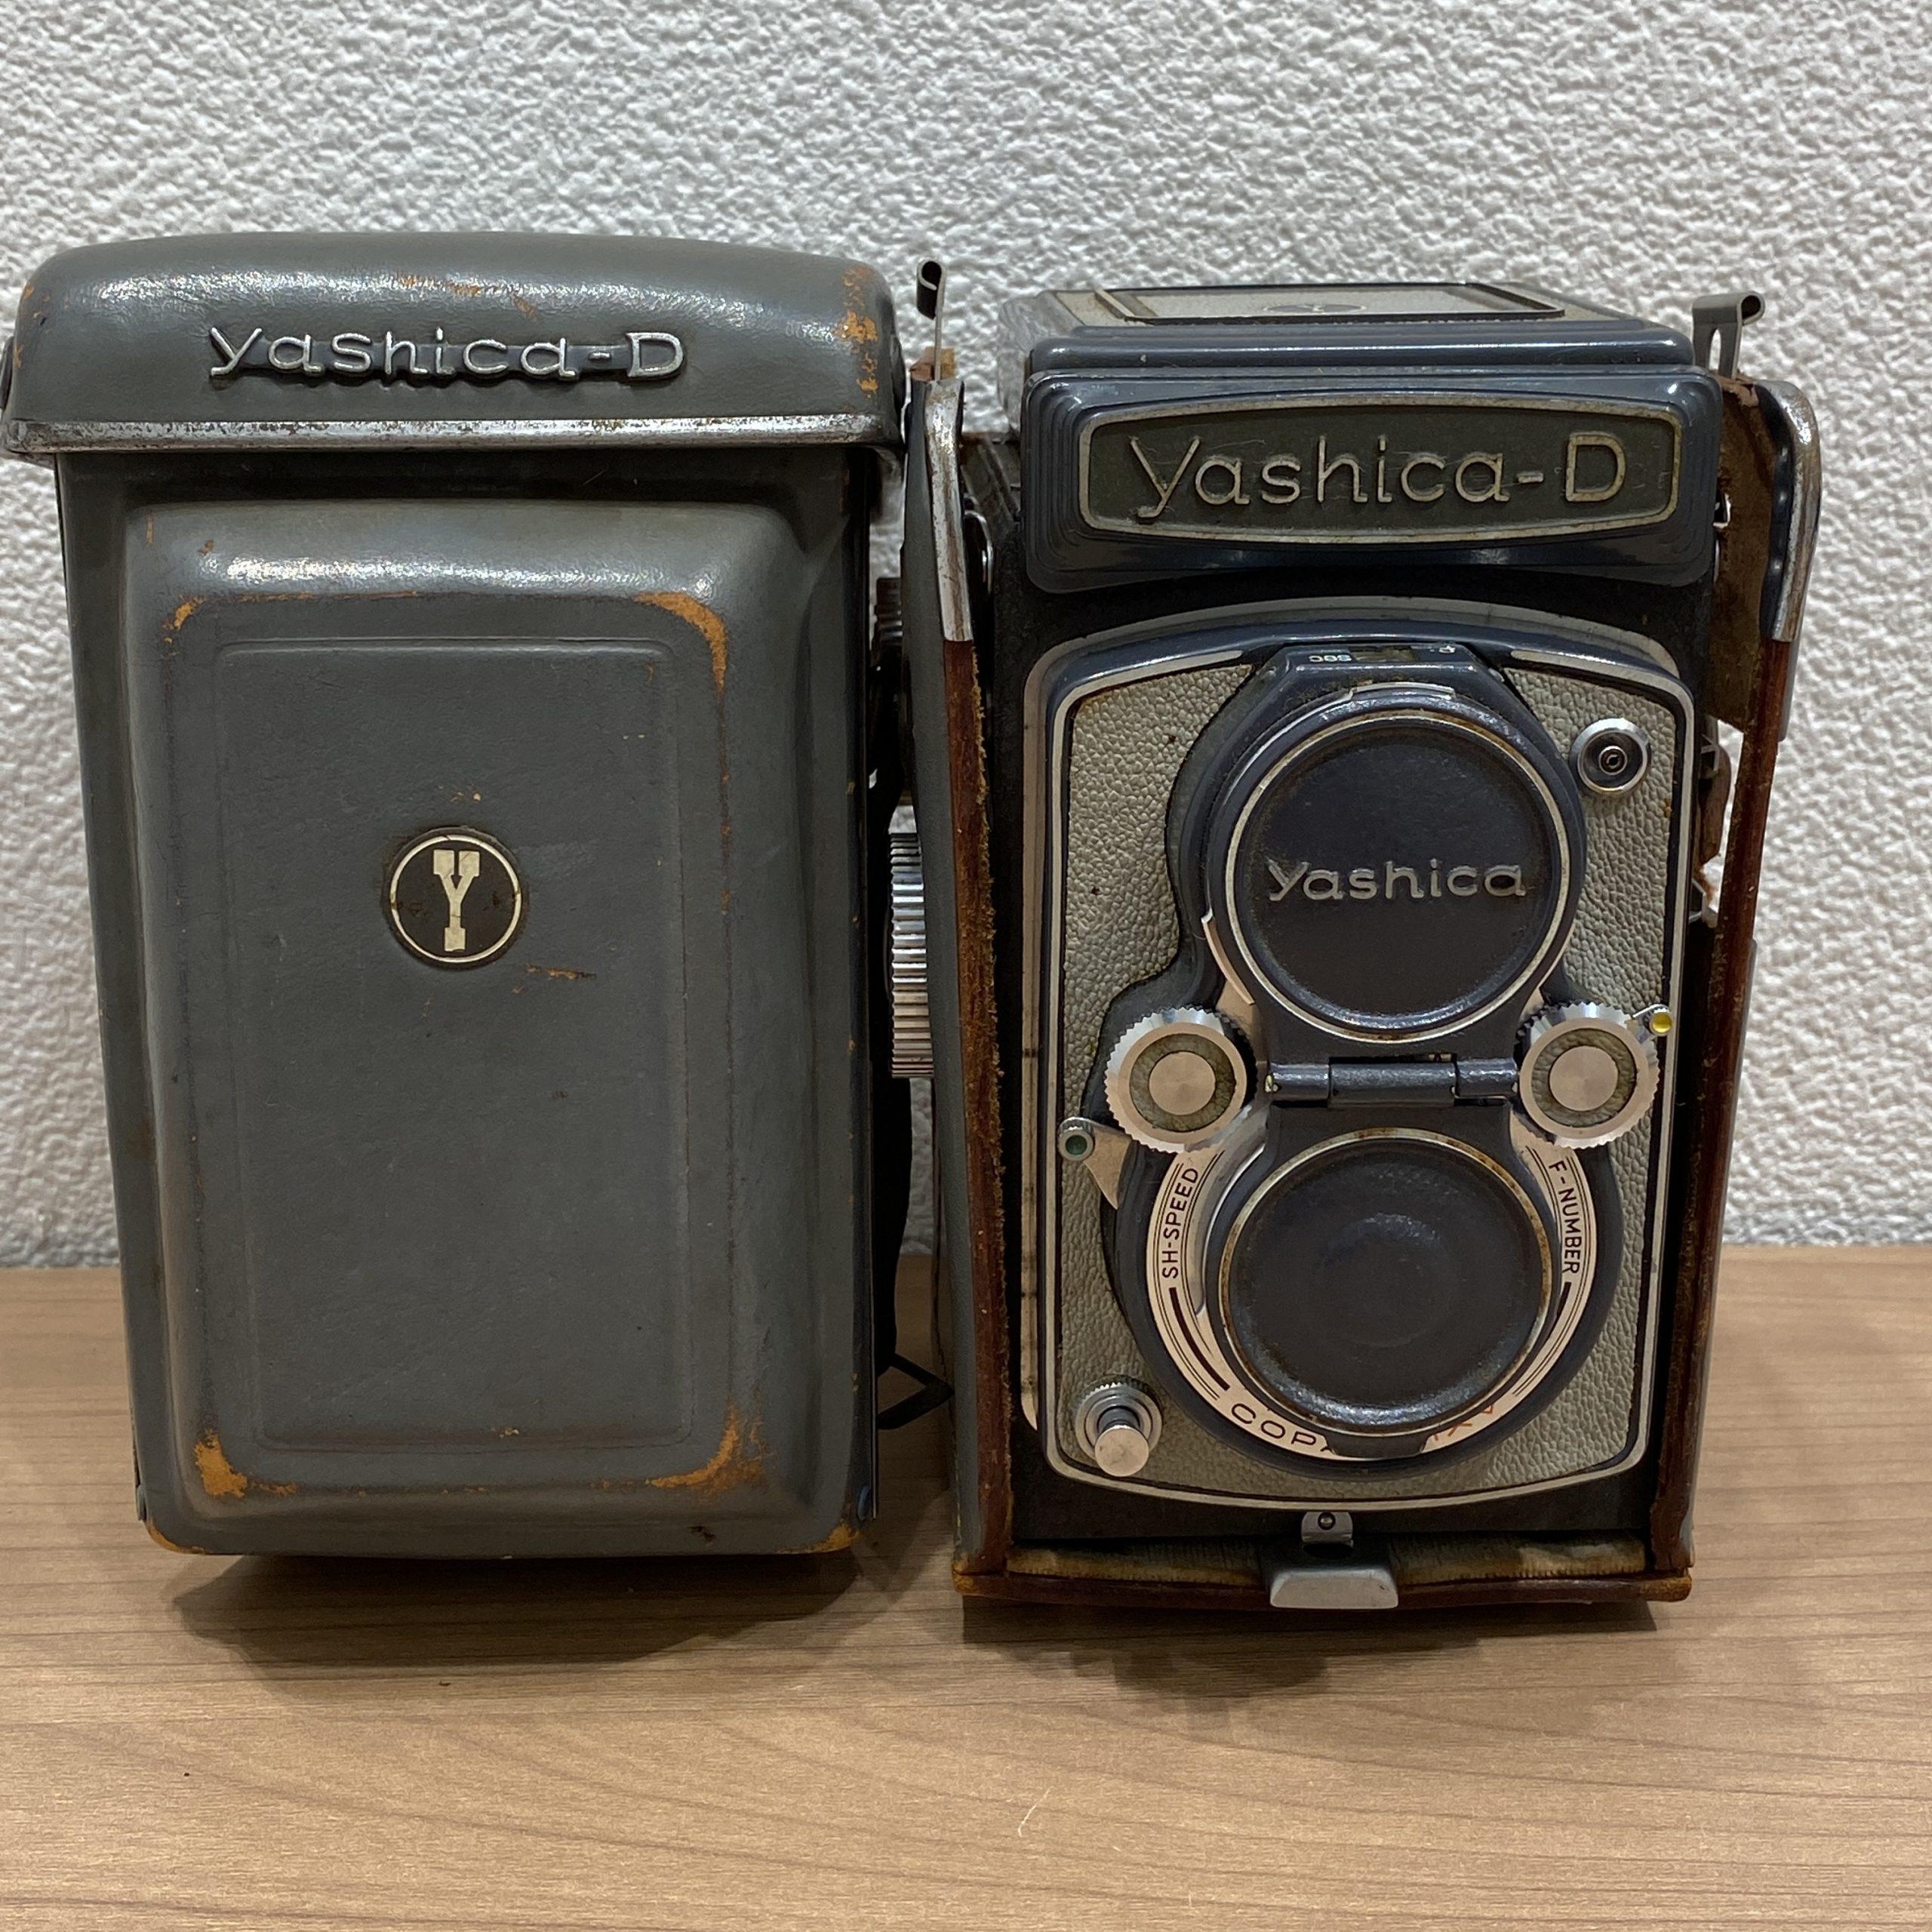 【YASHICA/ヤシカ】yashica-D 2眼レフカメラ 1:3.5 80mm